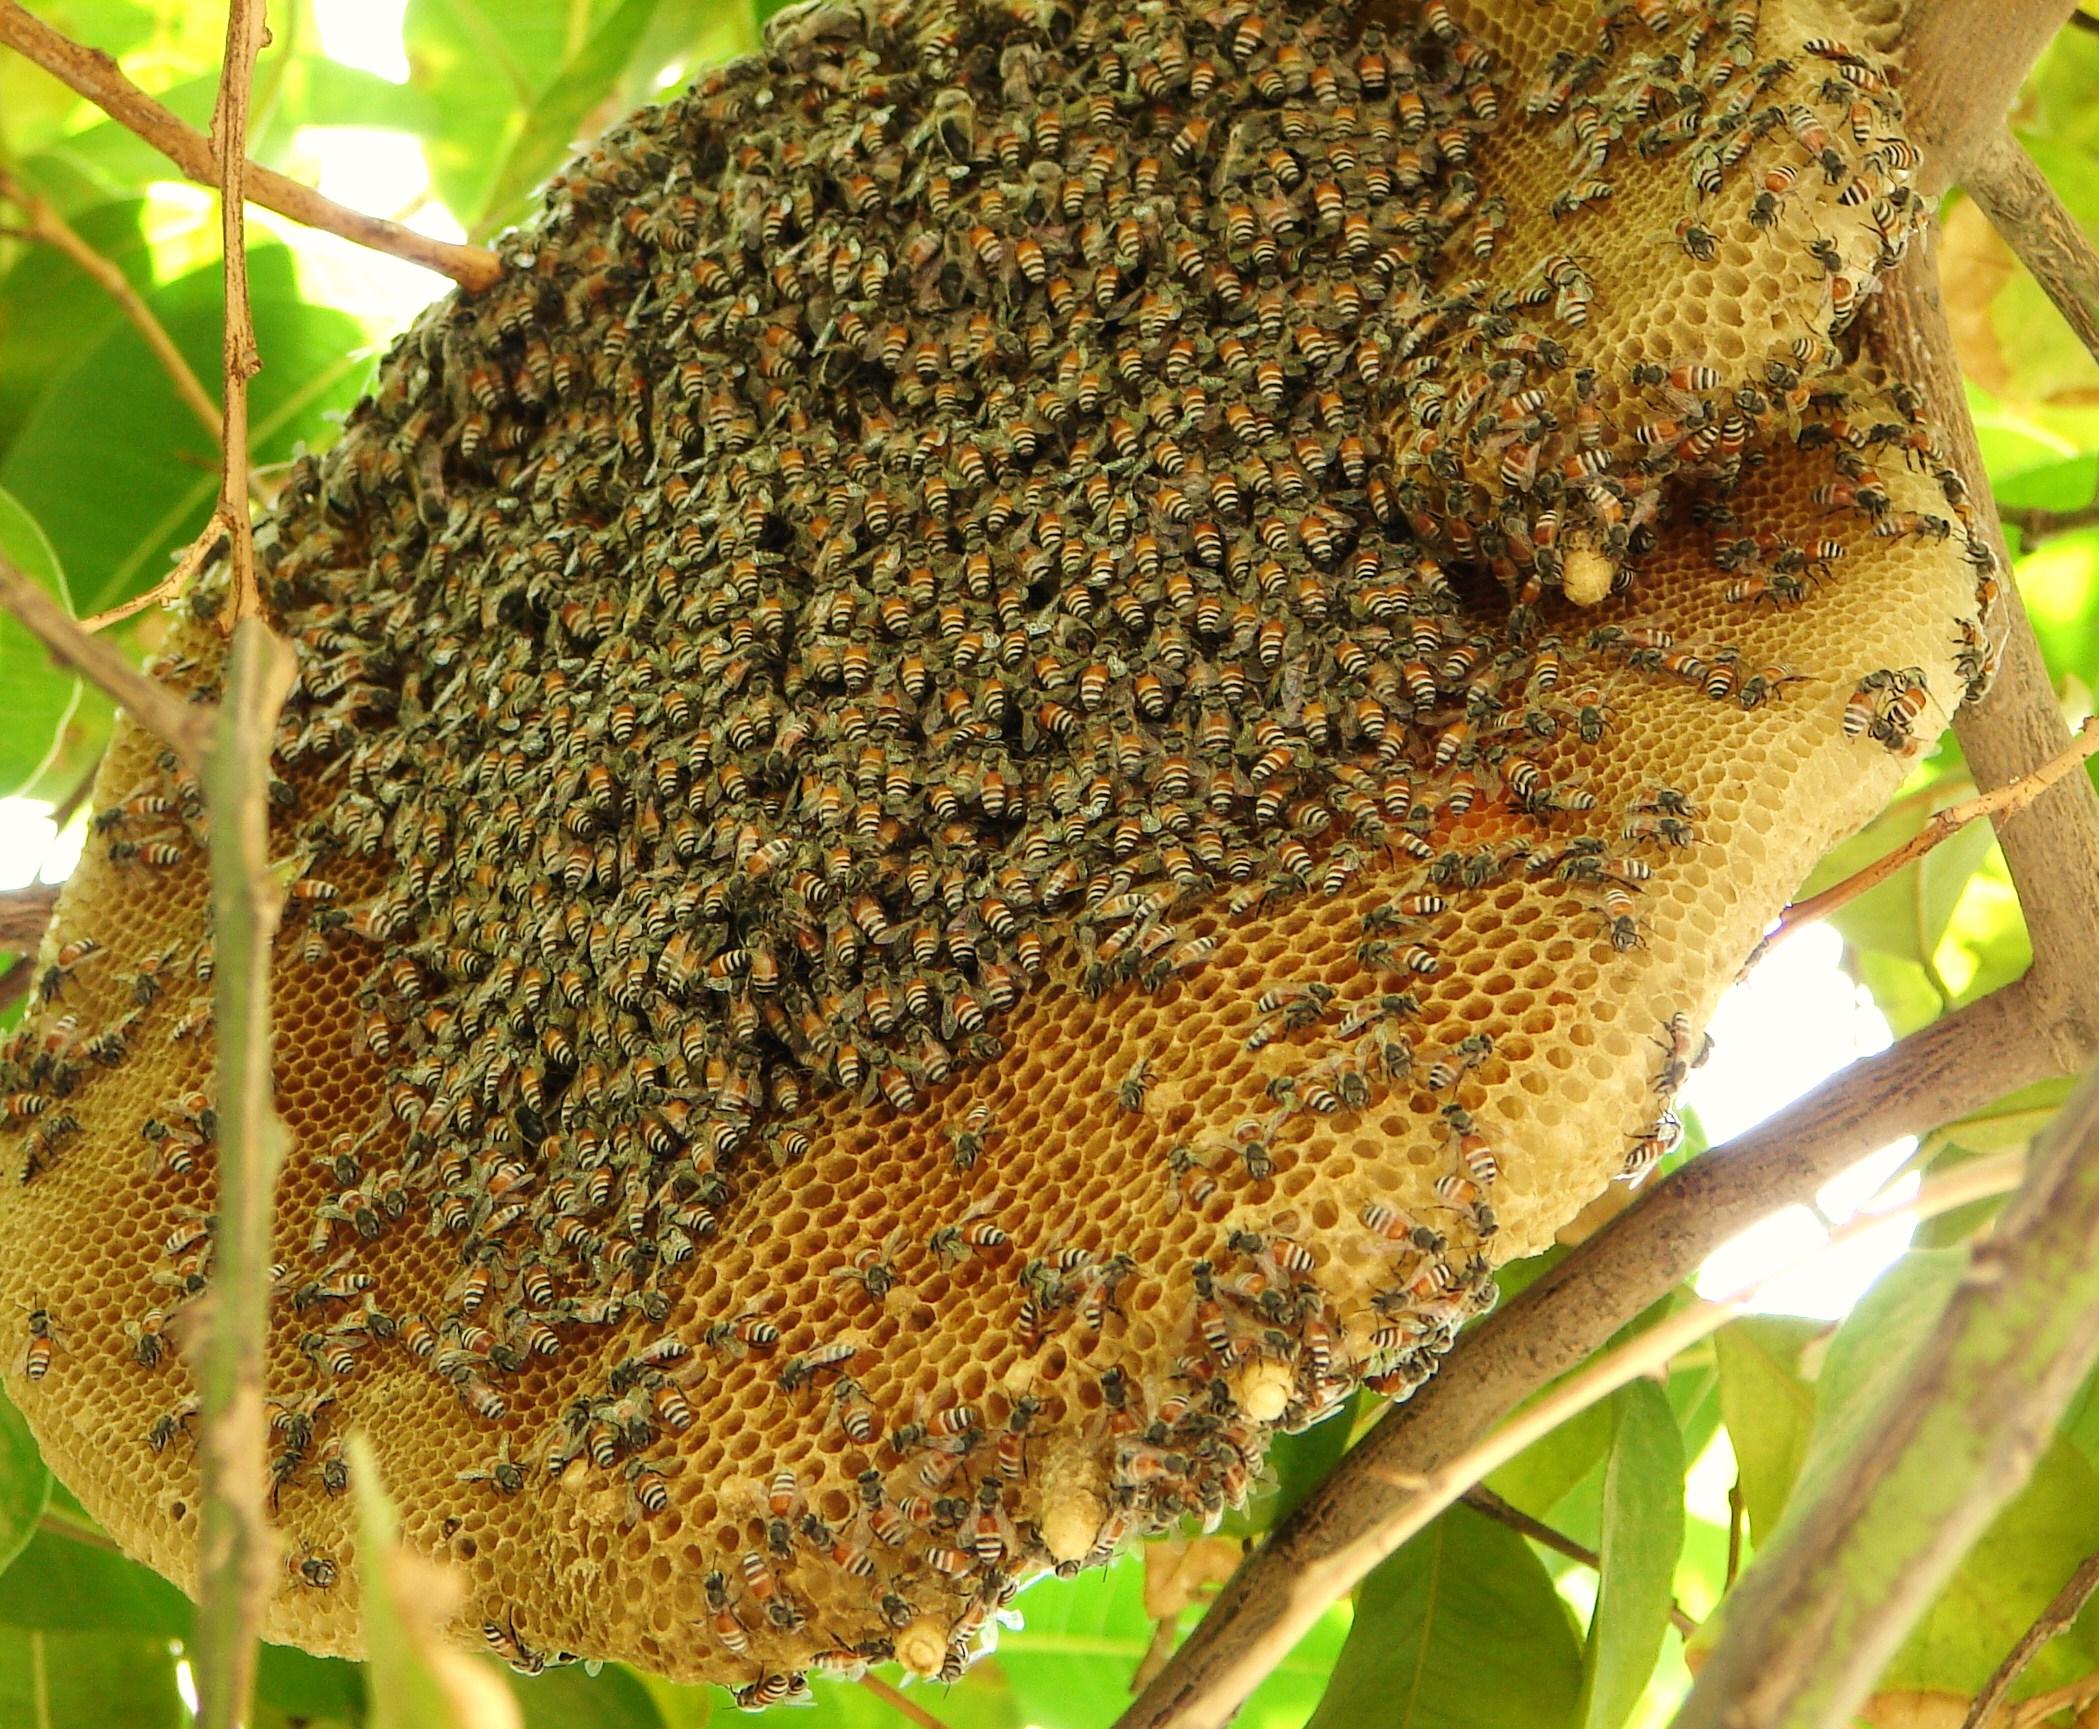 ... bees tries ...